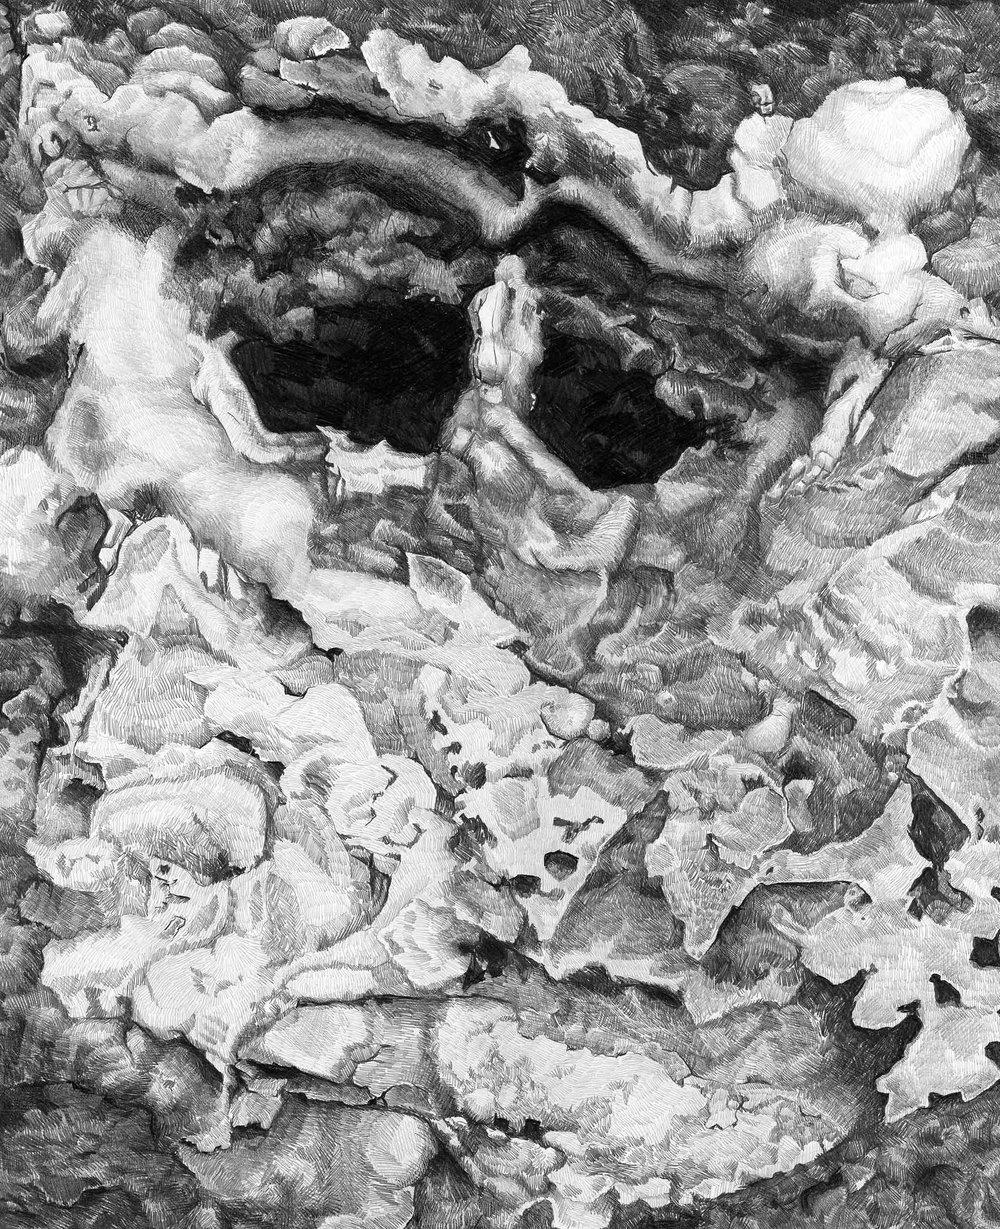 Nostrils,-Pencil-on-paper,-61-x-50cm,-2007.jpg